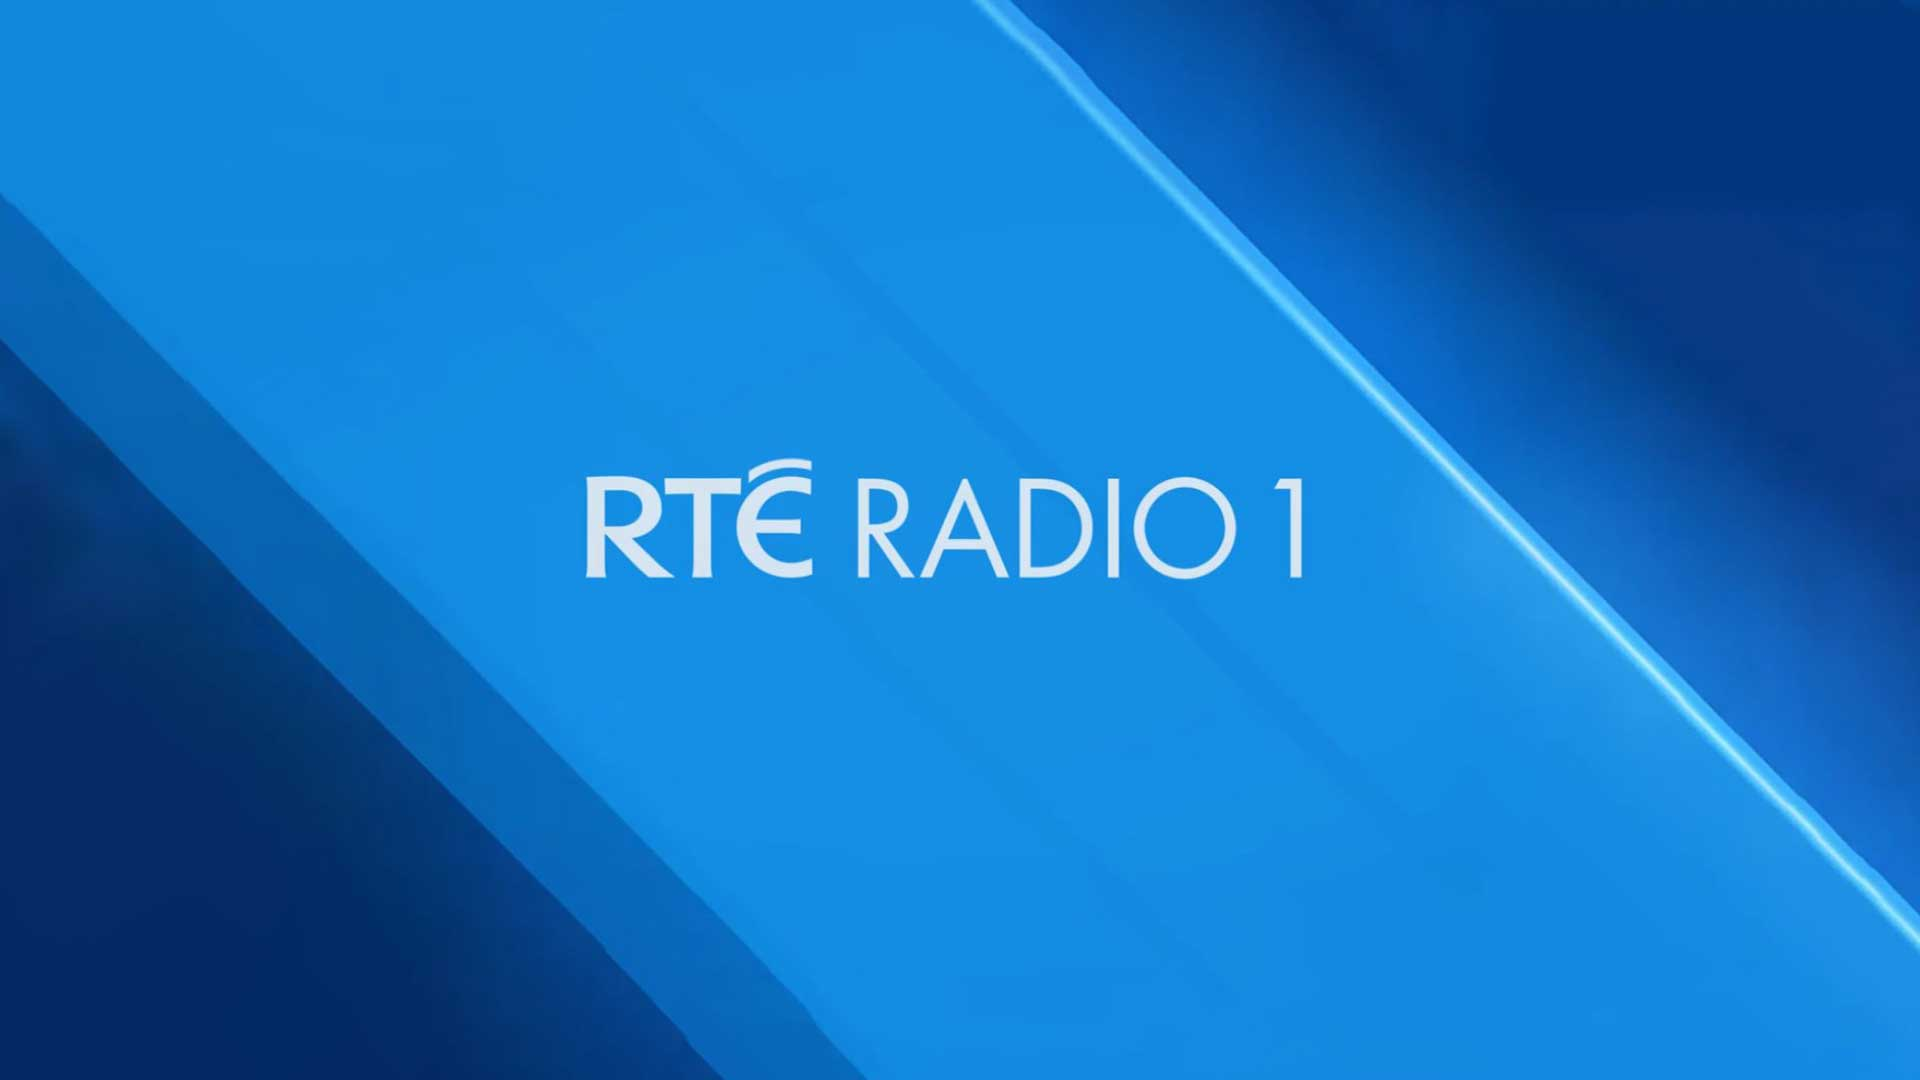 RTE-radio-one-1-kaper-video